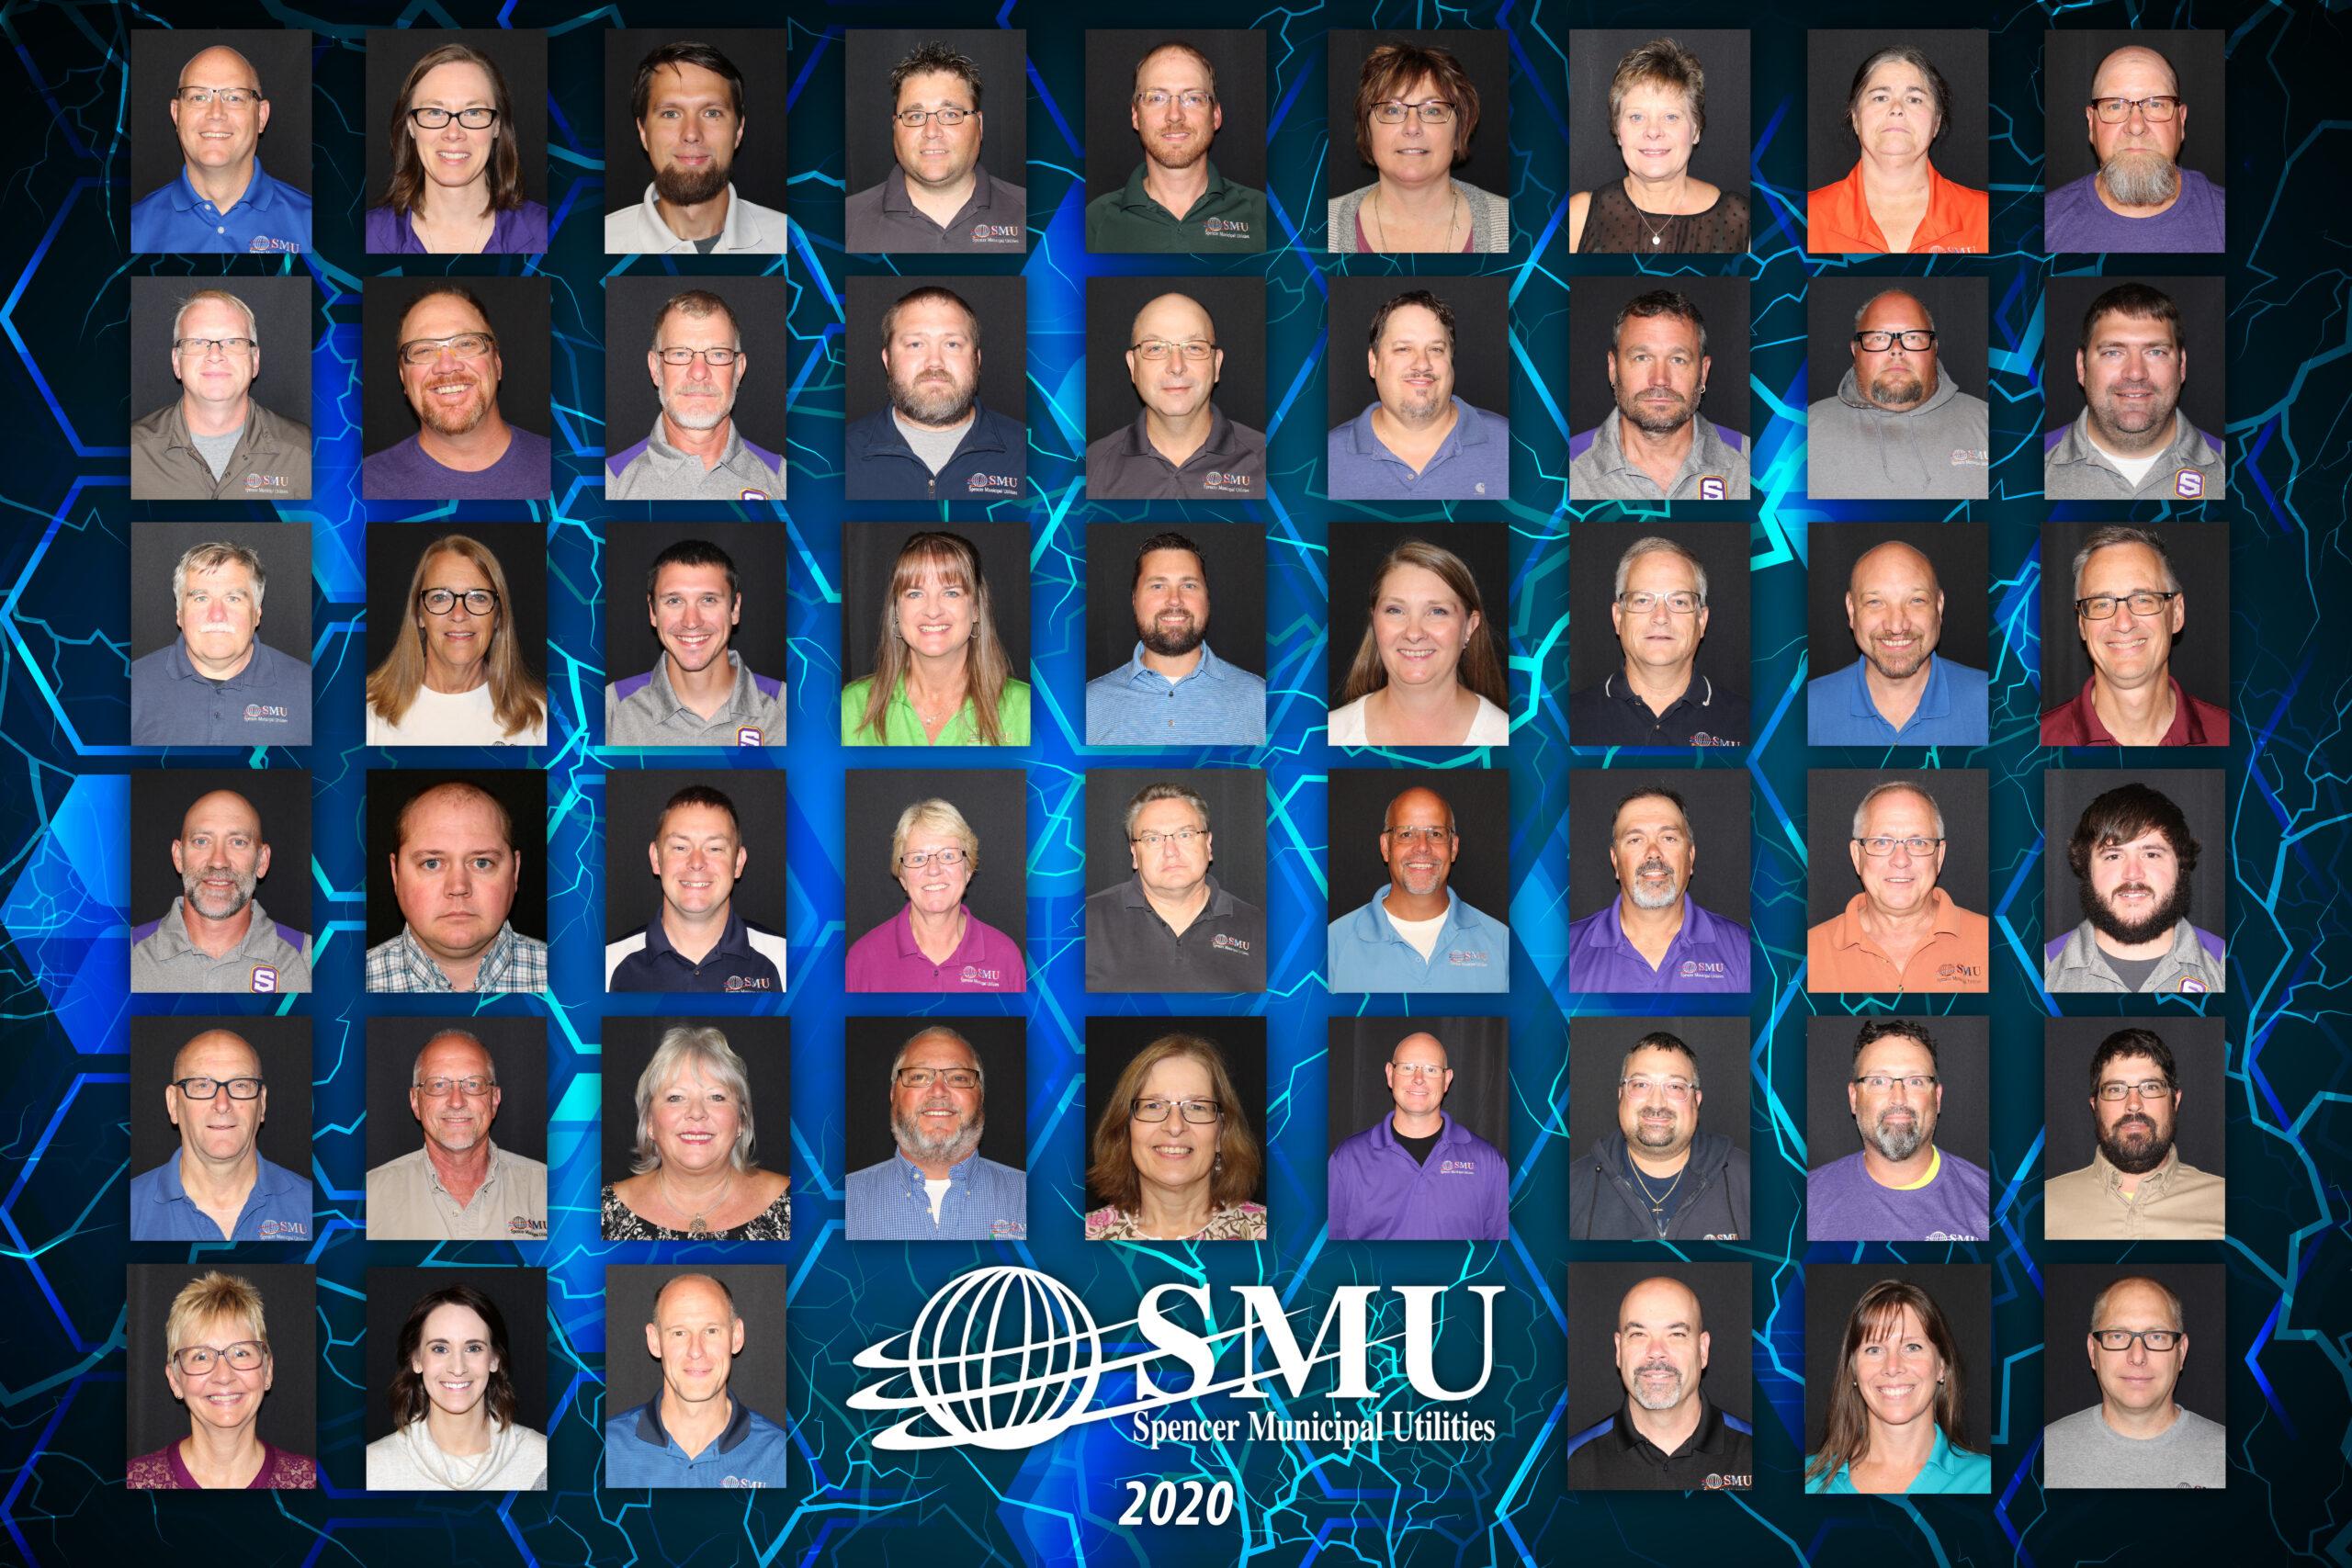 2020 SMU Employee Photo